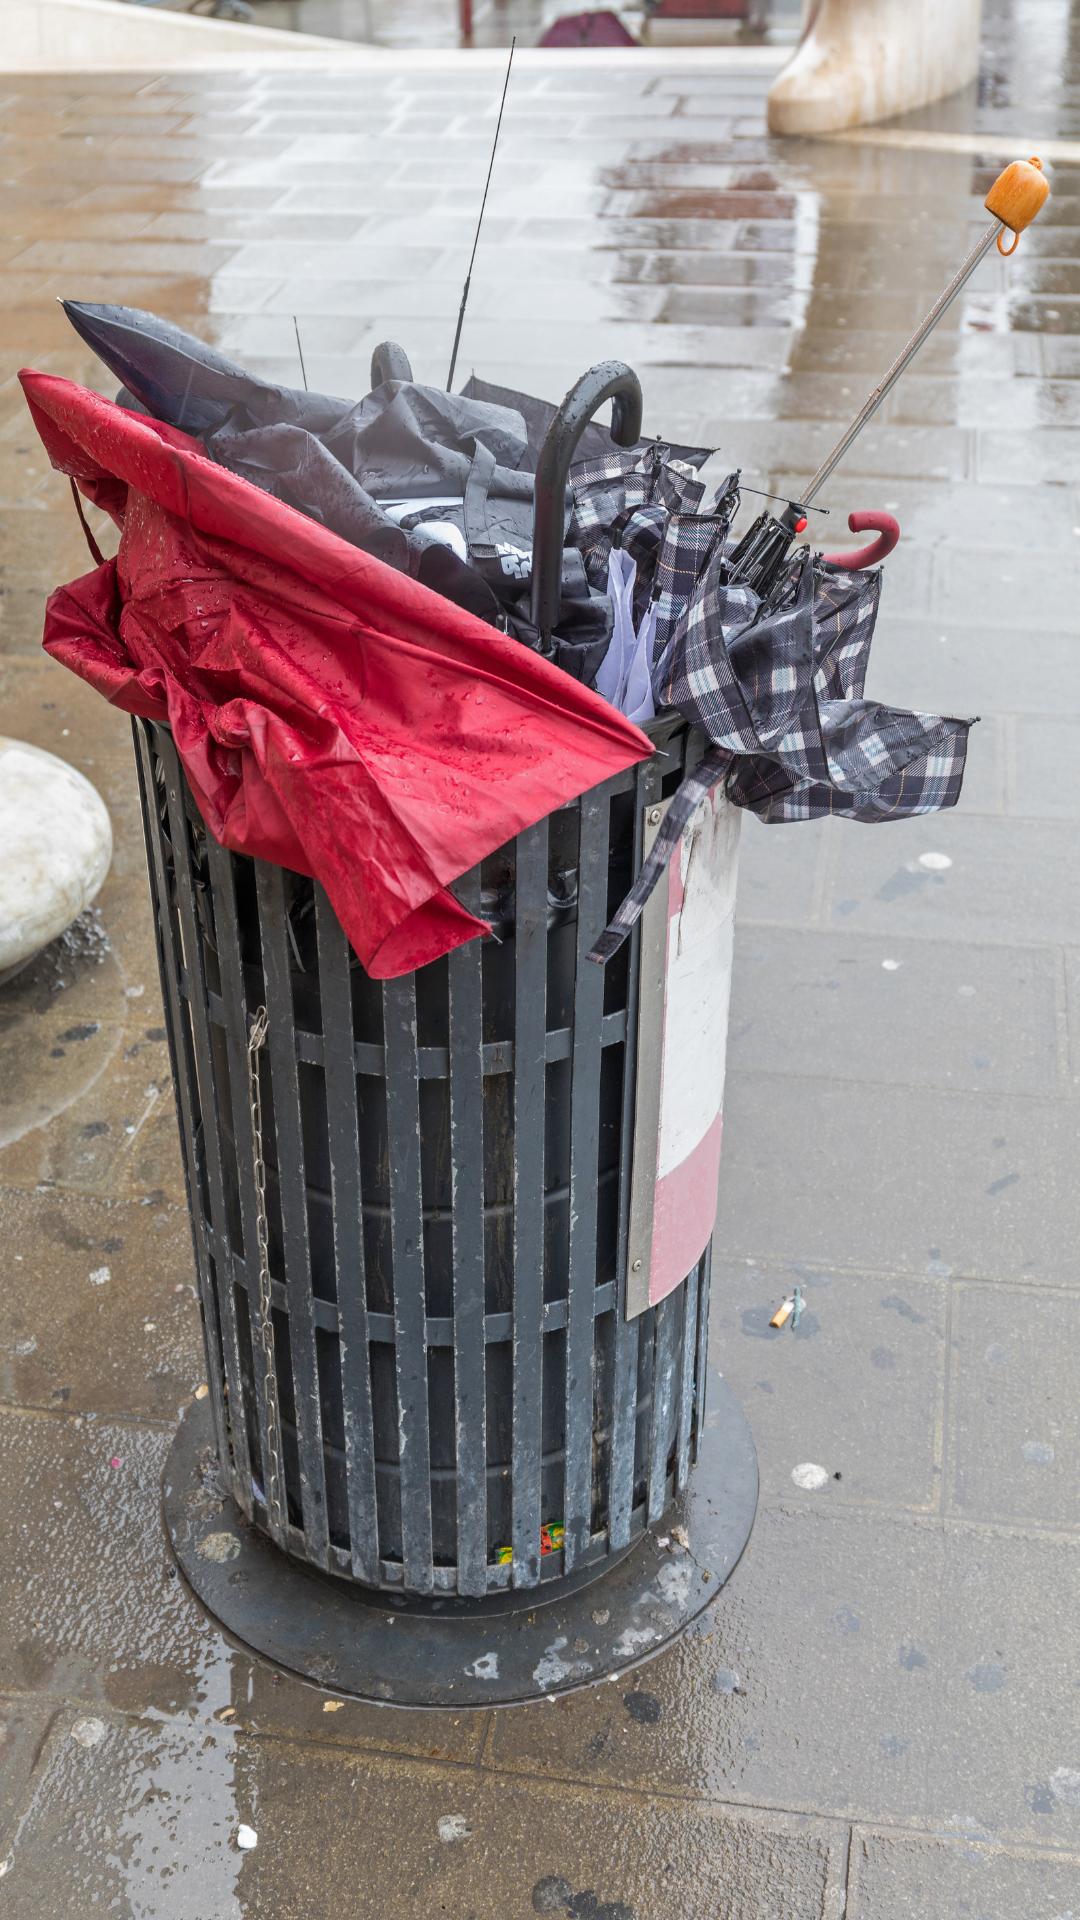 Guarda-chuvas no lixo